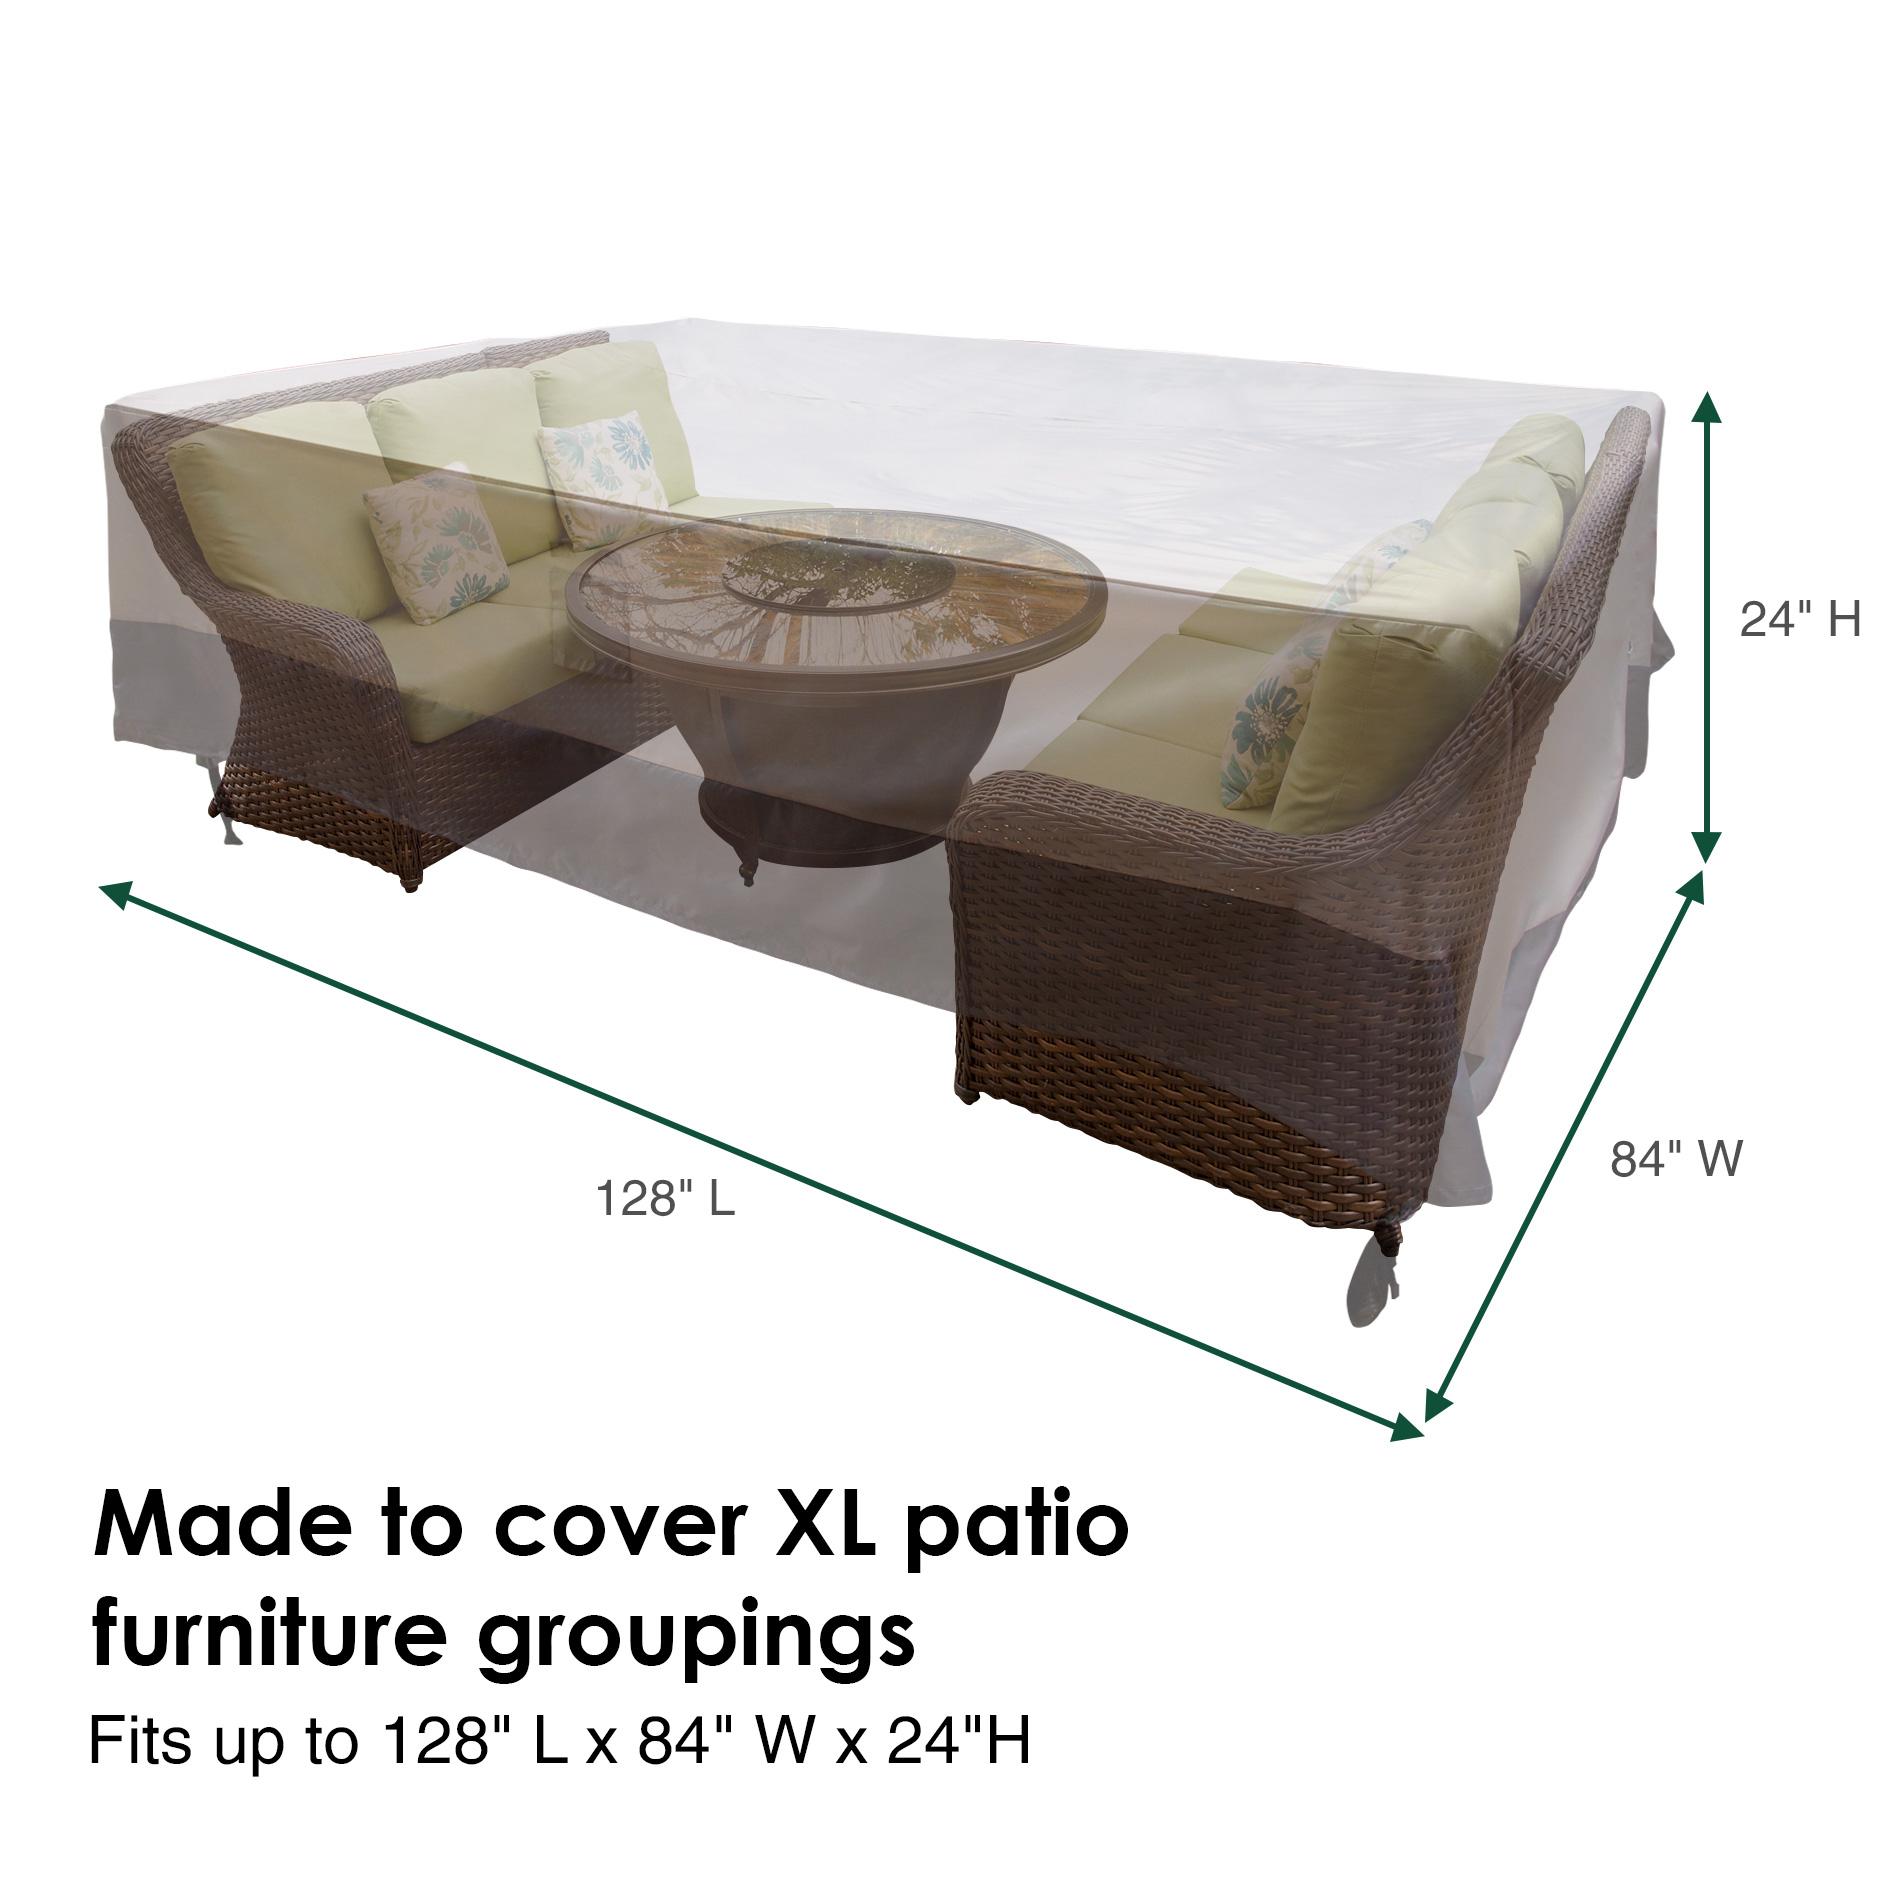 Water Resistant Rectangular Outdoor Patio Set Cover Reusable for measurements 1900 X 1900